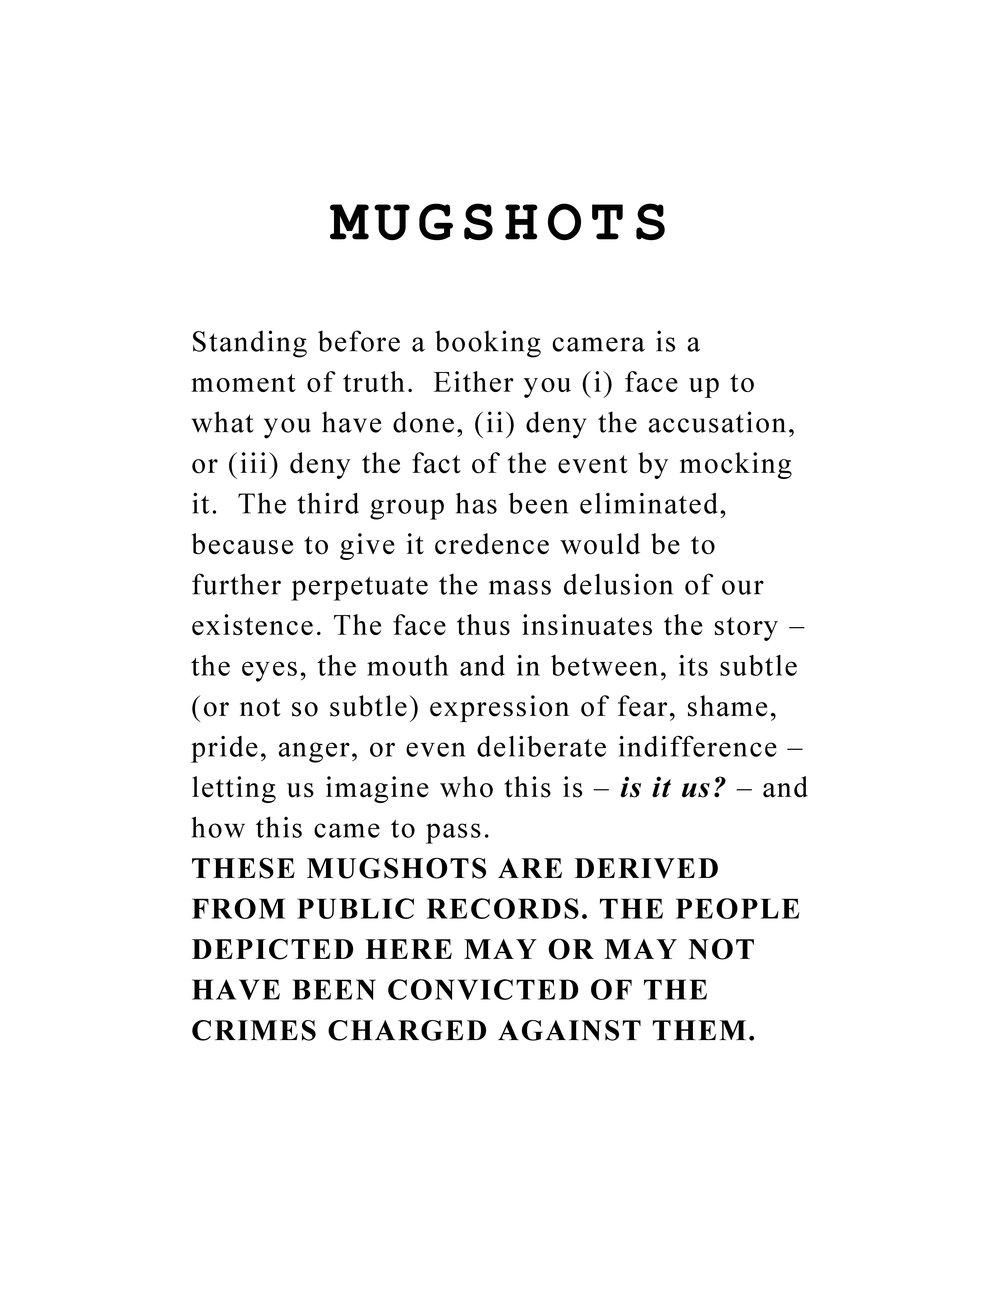 Mugshots title page 1 JPG.jpg